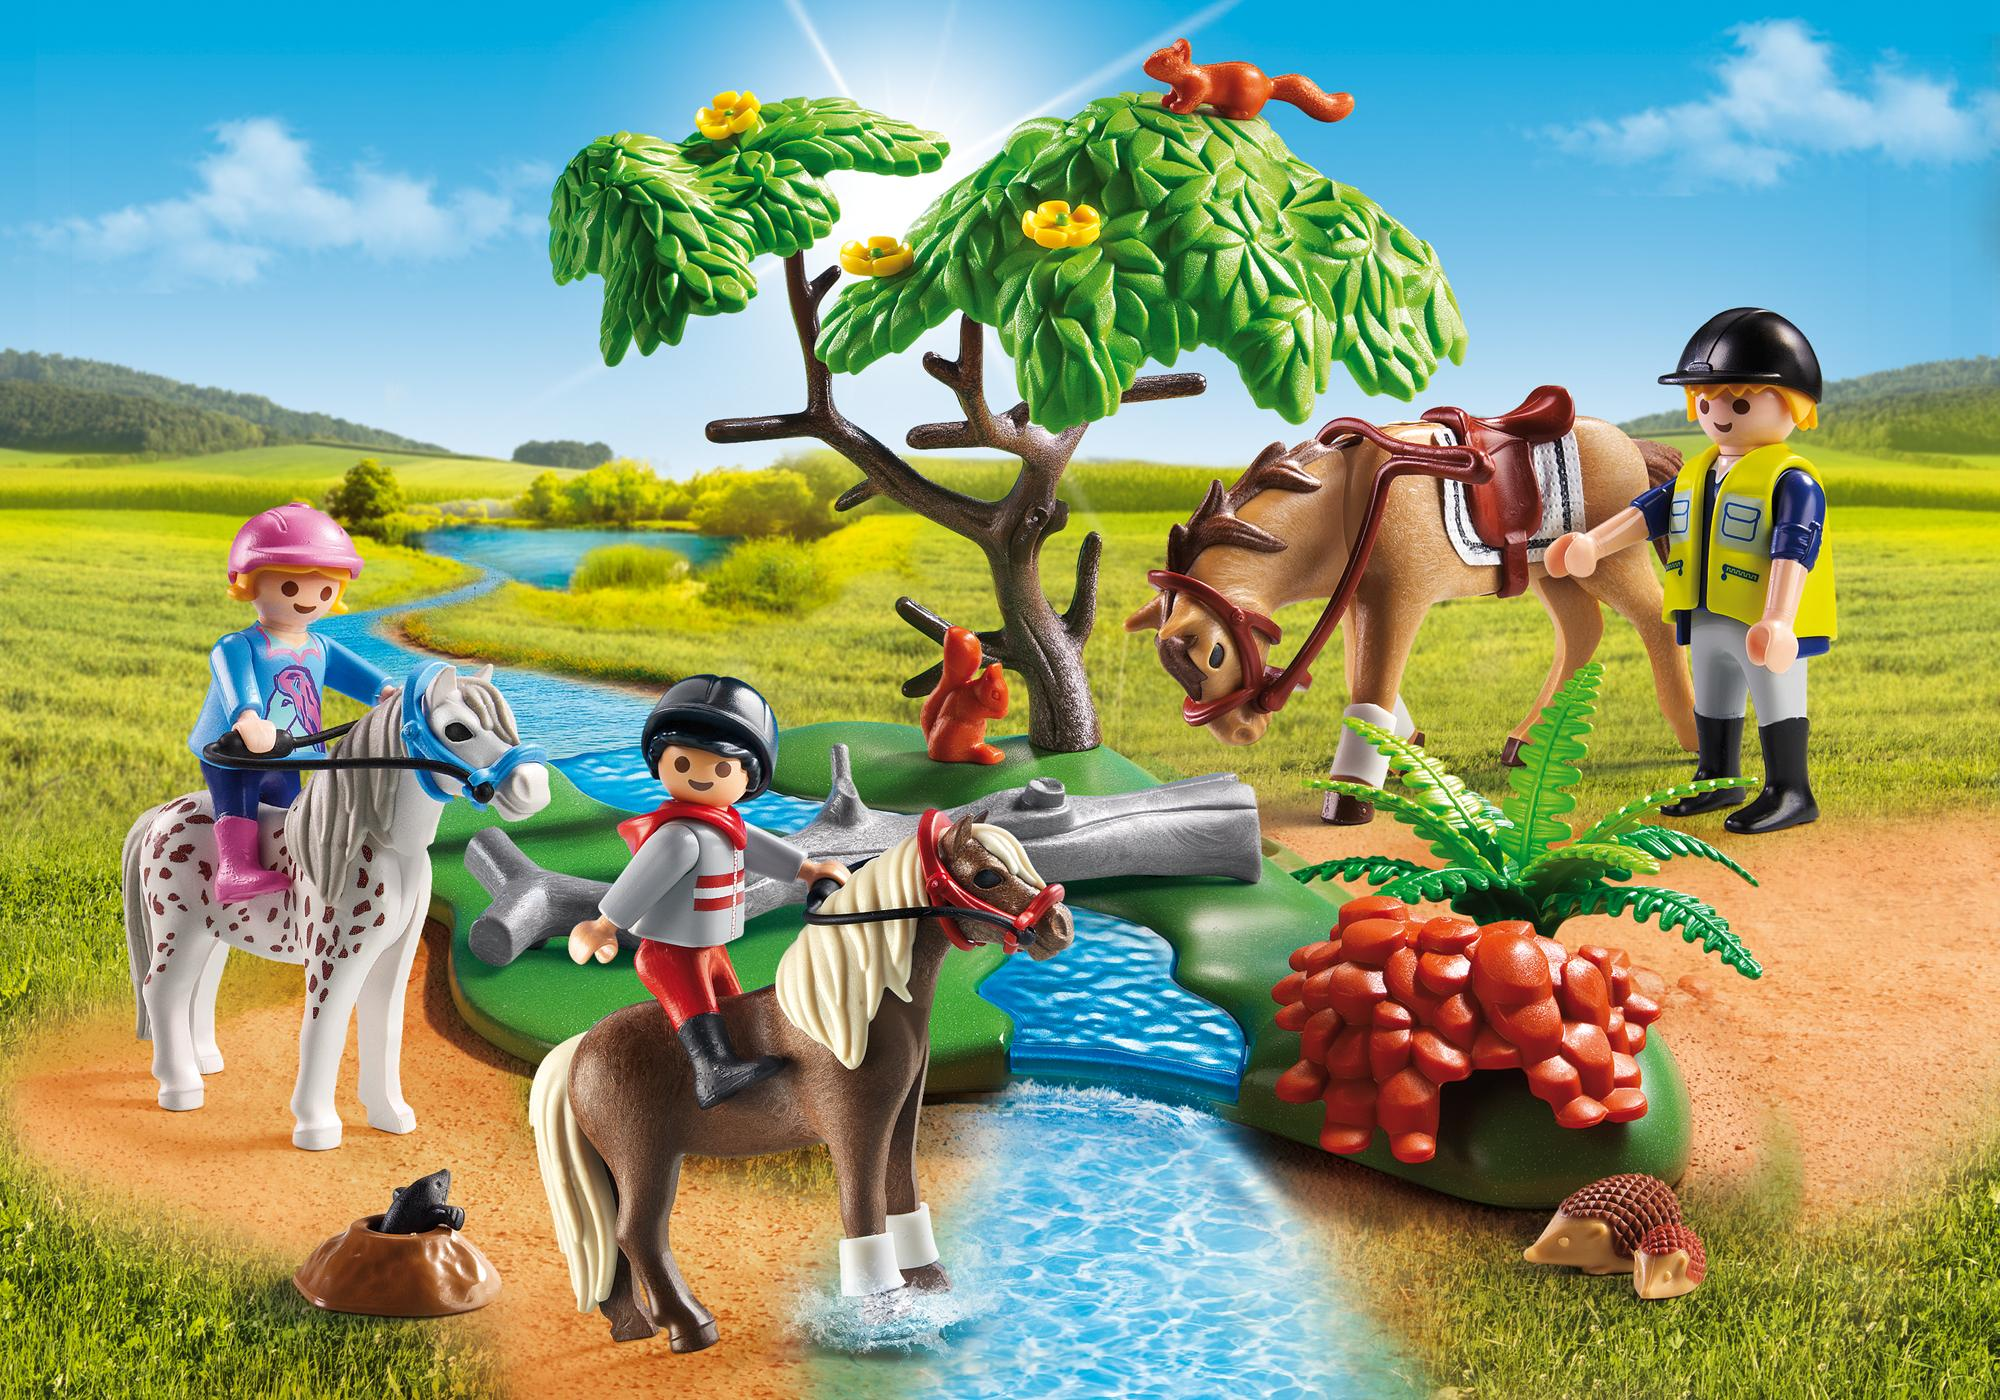 http://media.playmobil.com/i/playmobil/6947_product_detail/Cavaliers avec poneys et cheval